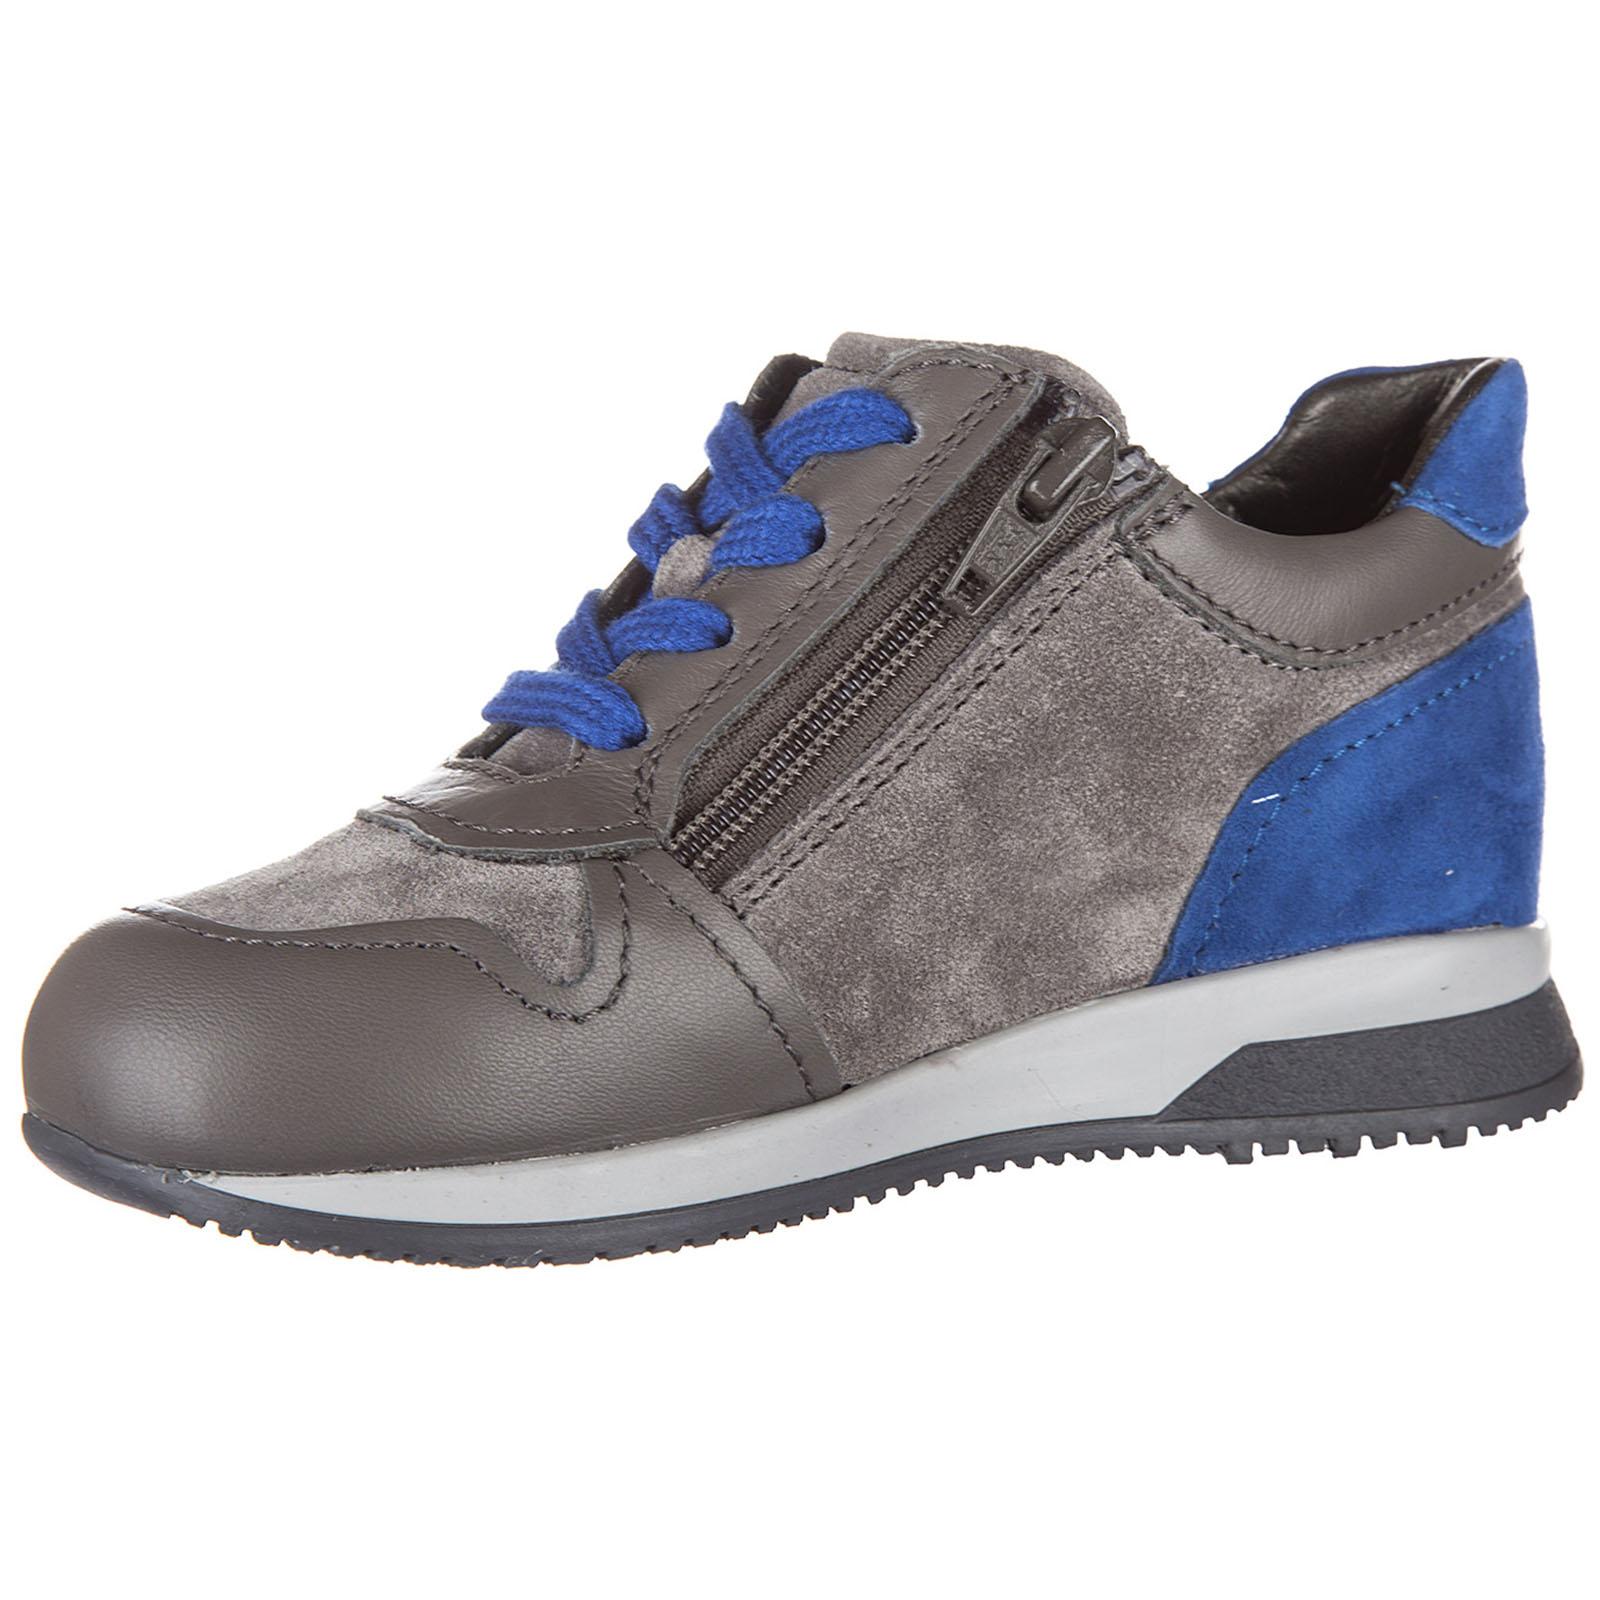 Boys shoes baby child sneakers camoscio elective